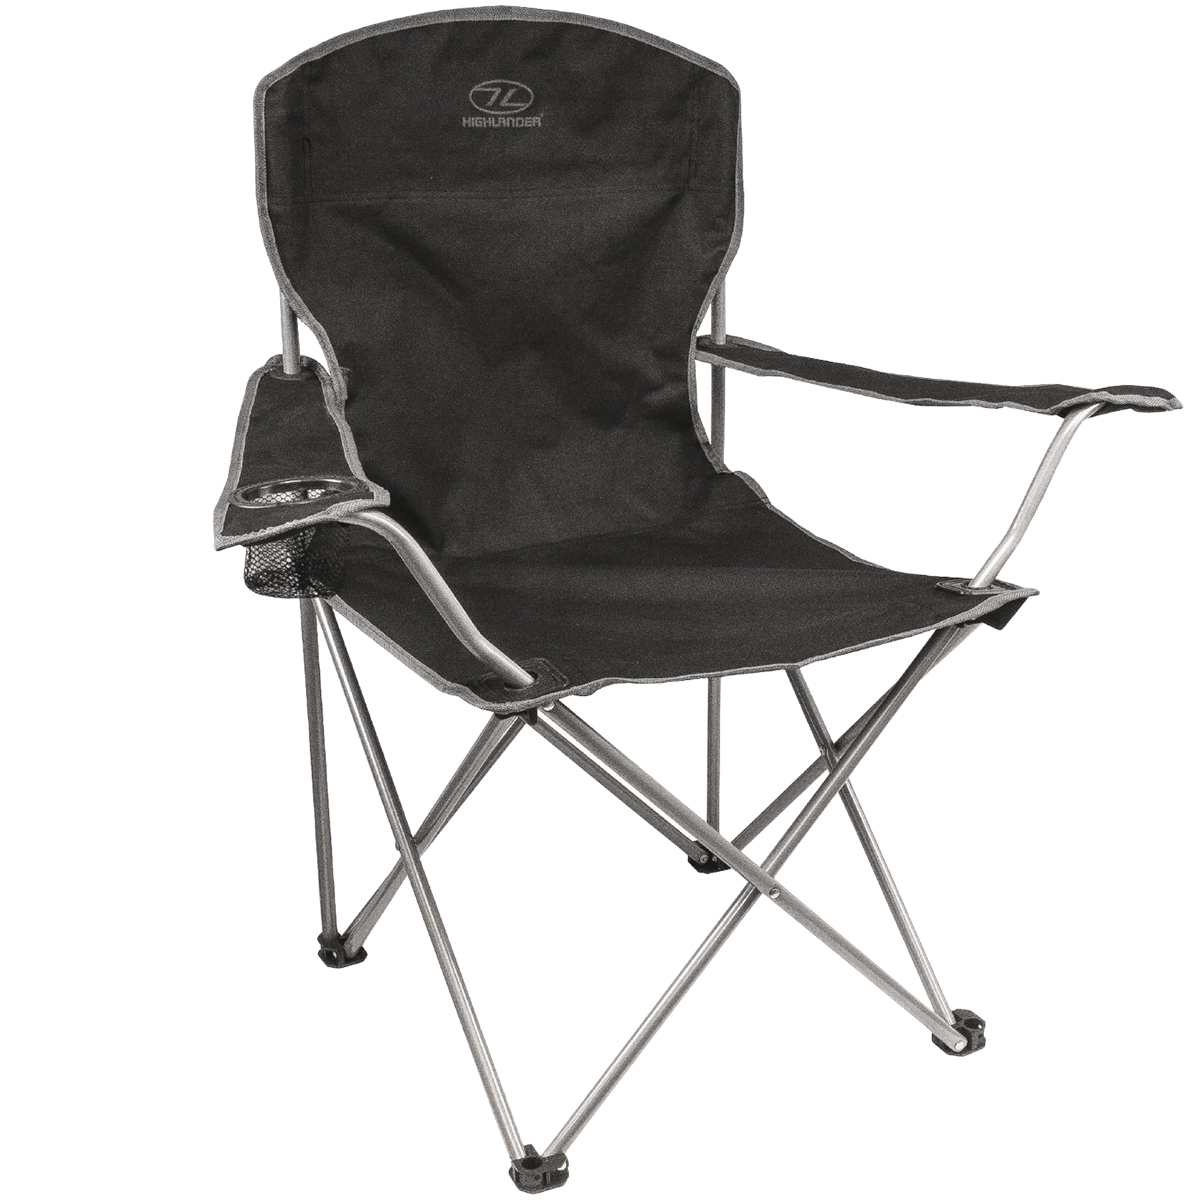 Highlander Folding Camp Chair Black Black